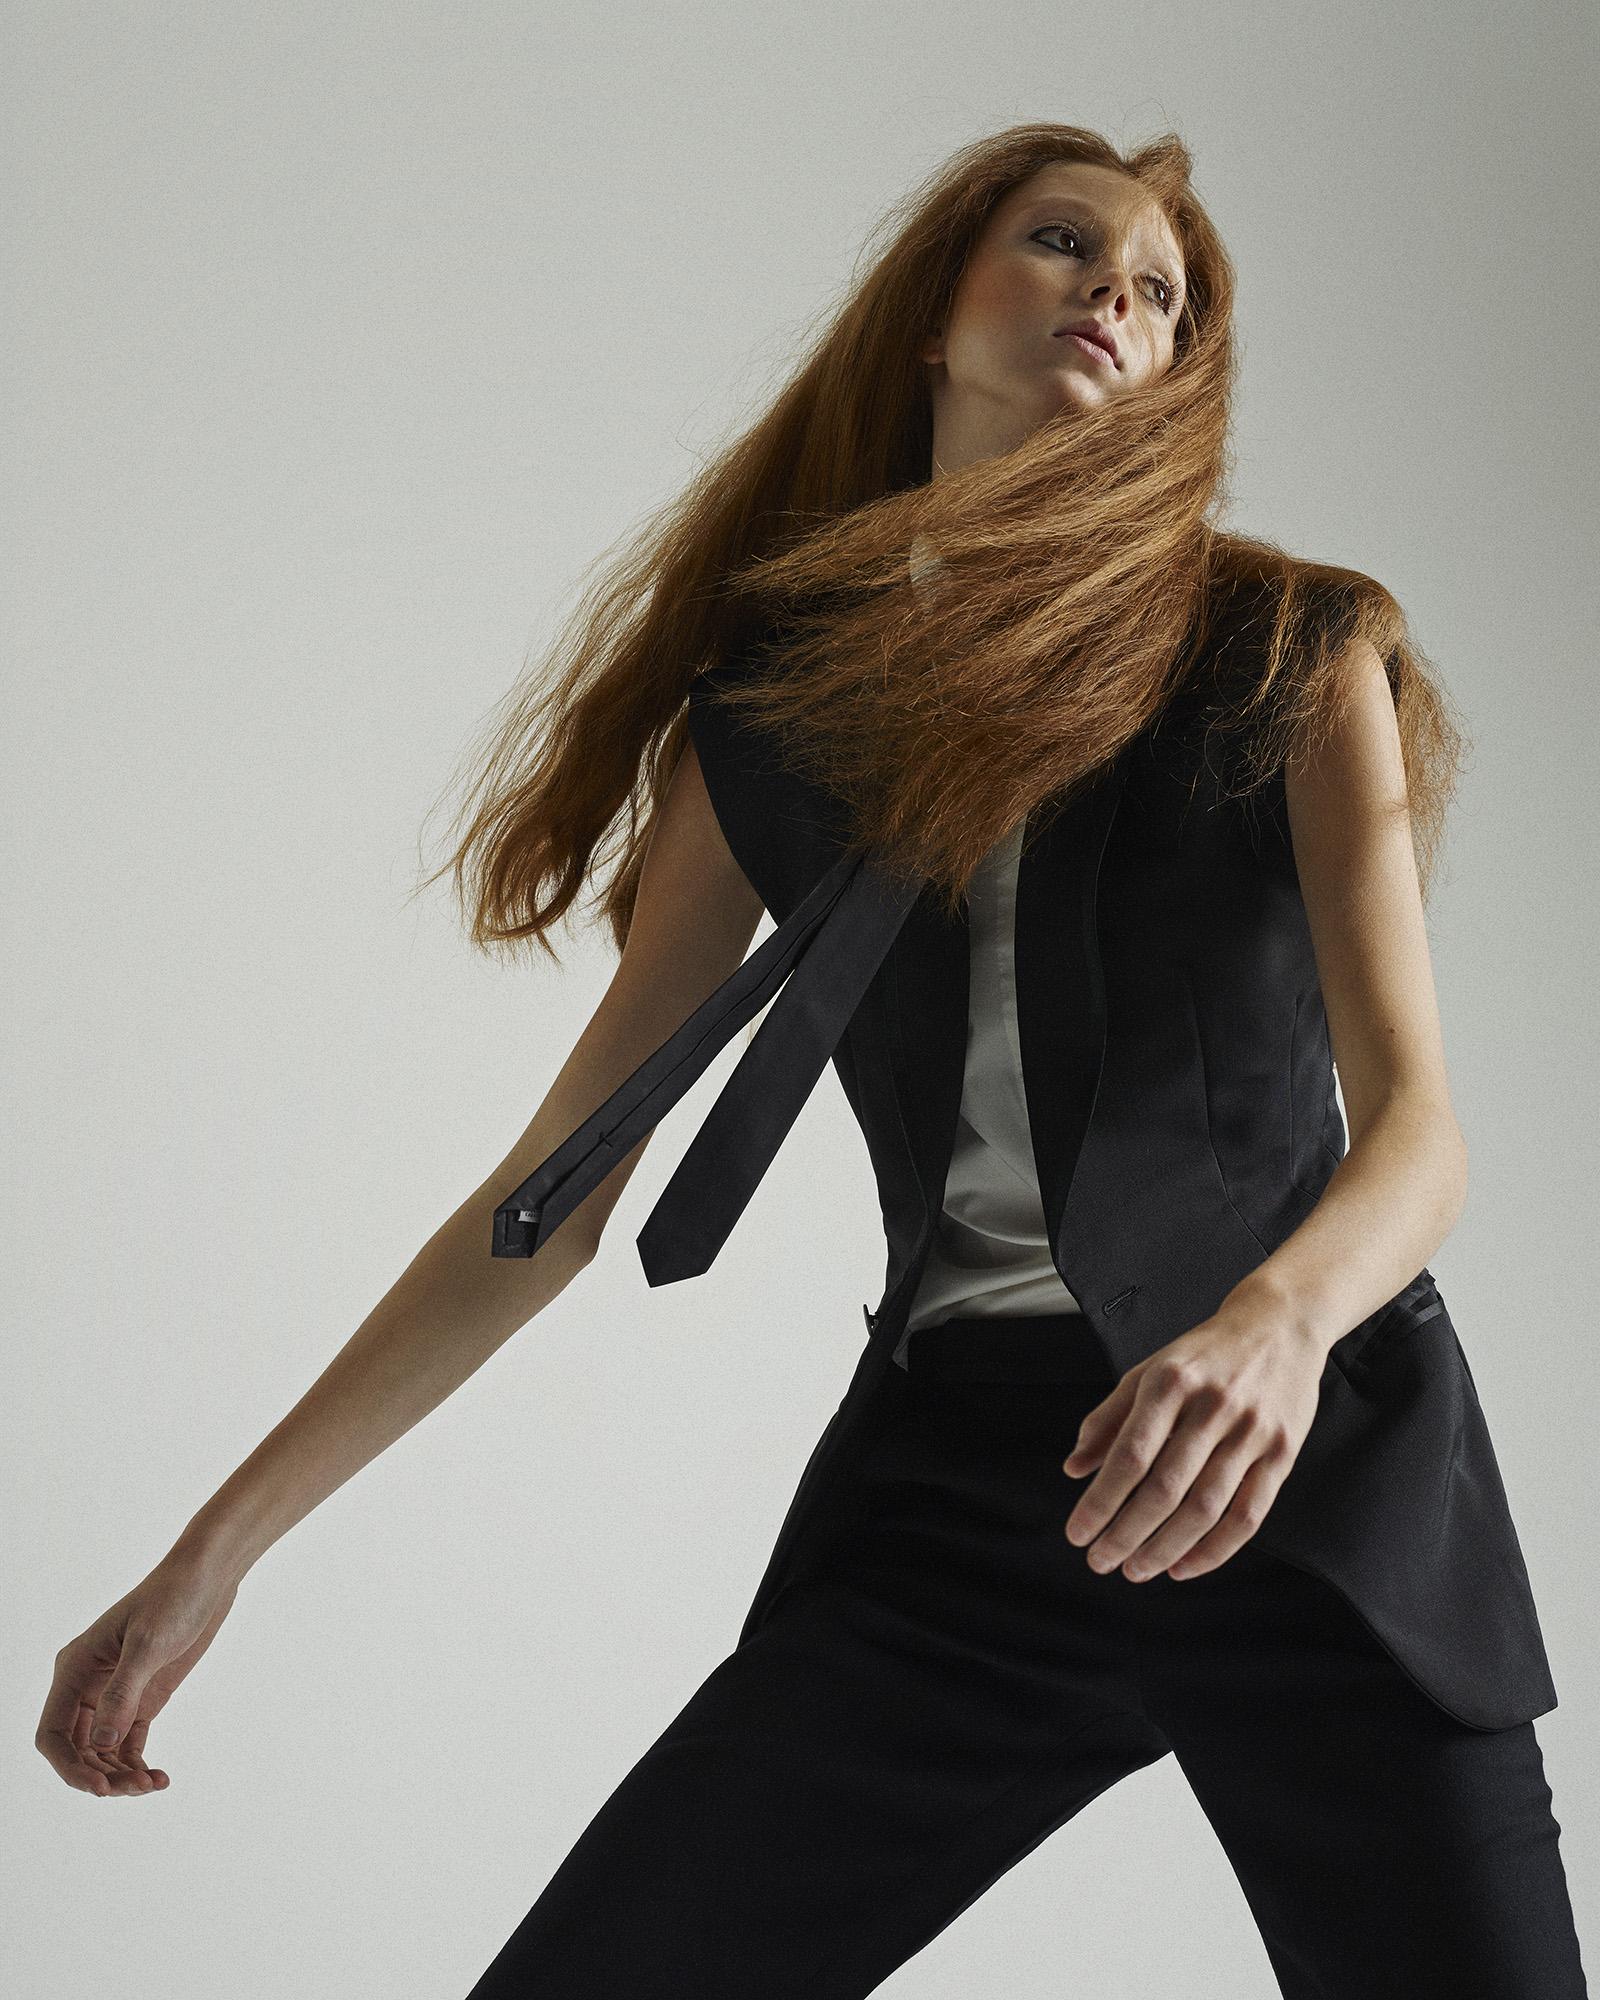 fashion_test_natalie15988.jpg